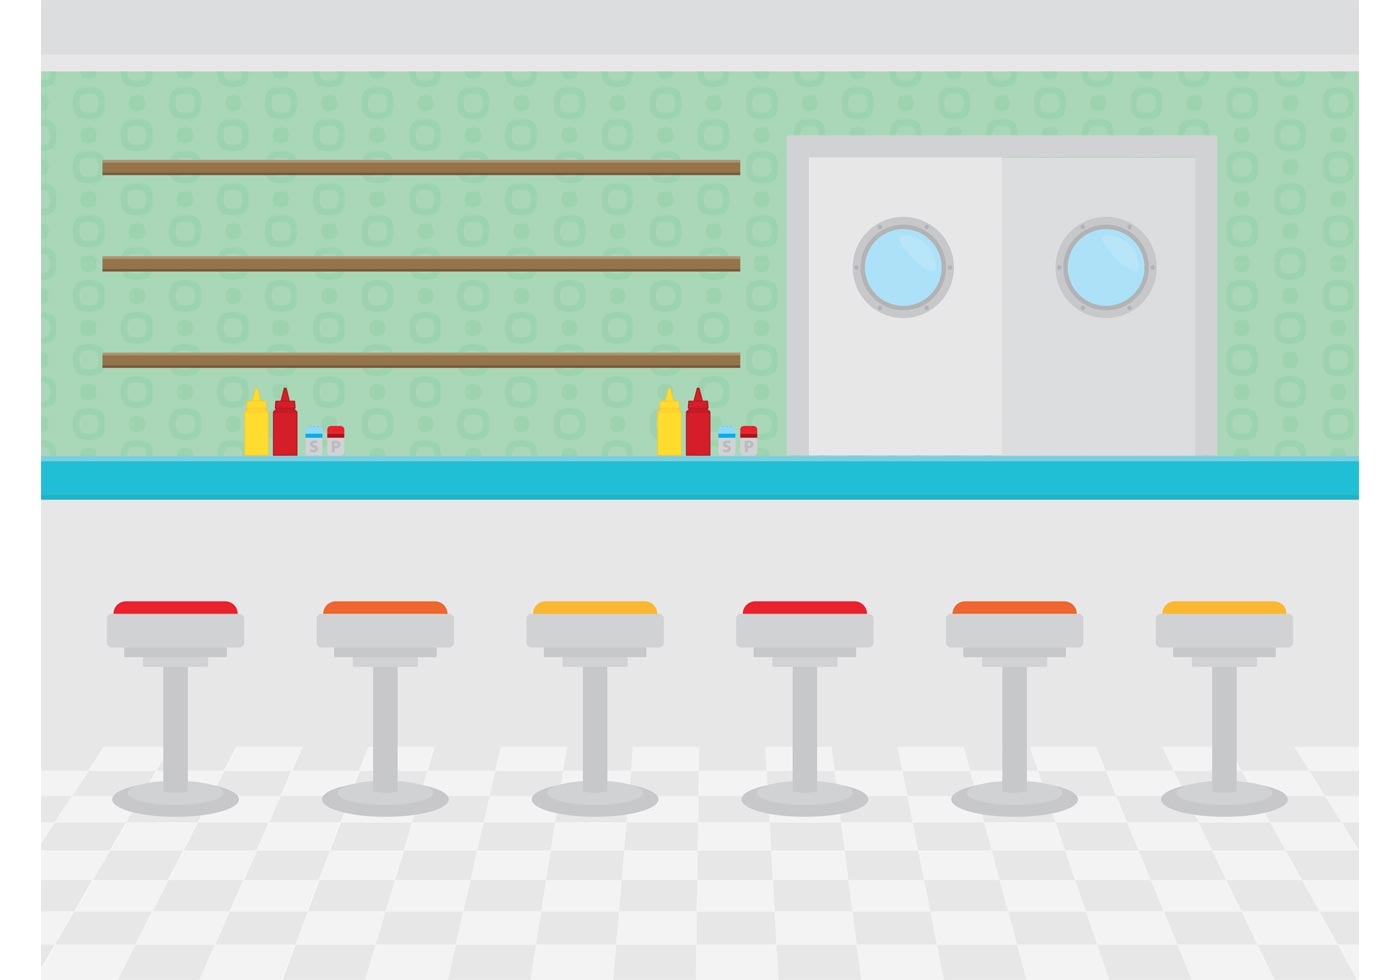 Restaurant interior diner download free vector art